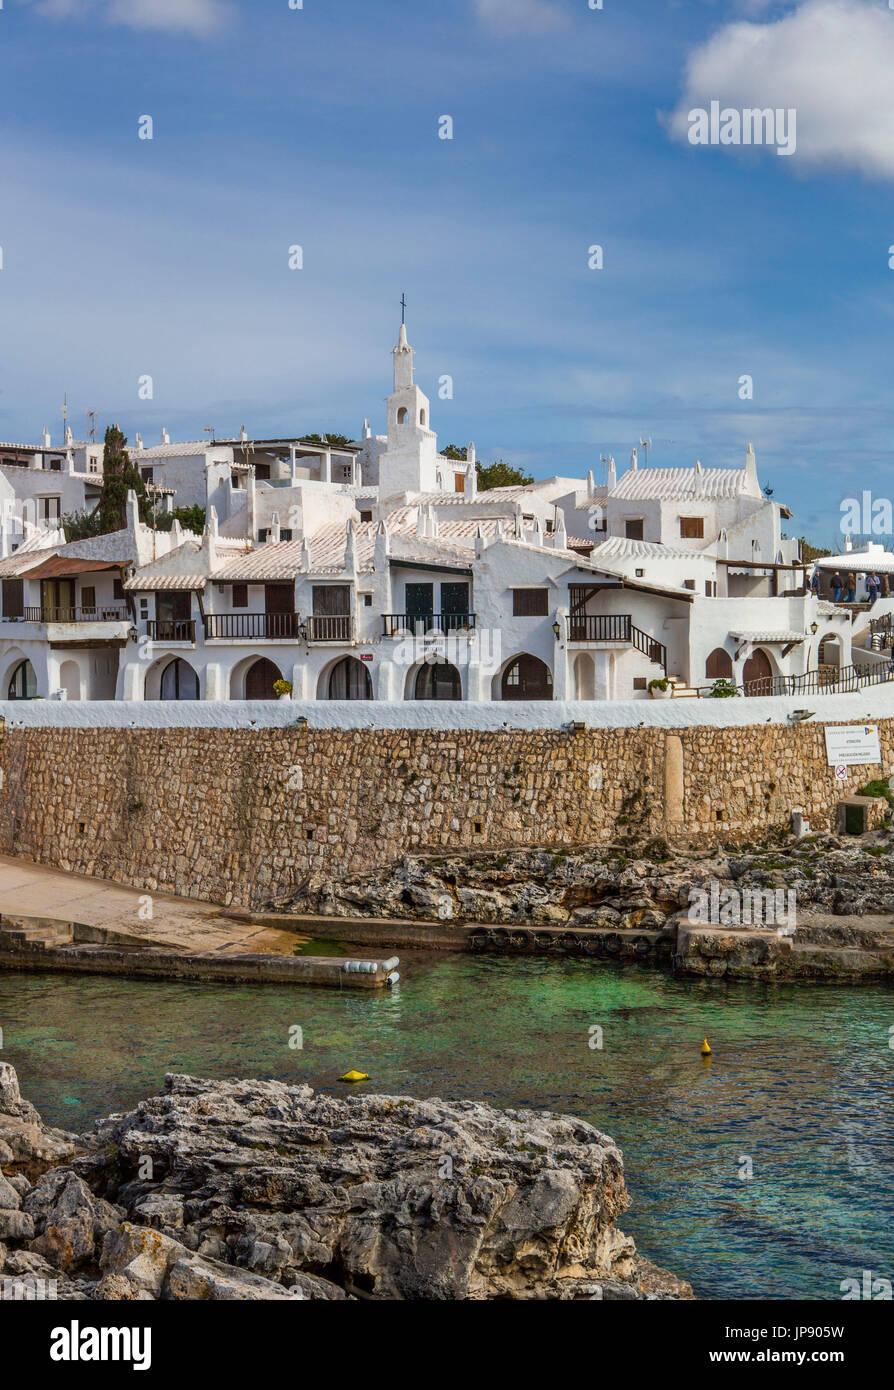 Spain, Balearic Islands, Menorca Island, Old Binibeca Fishing Village - Stock Image